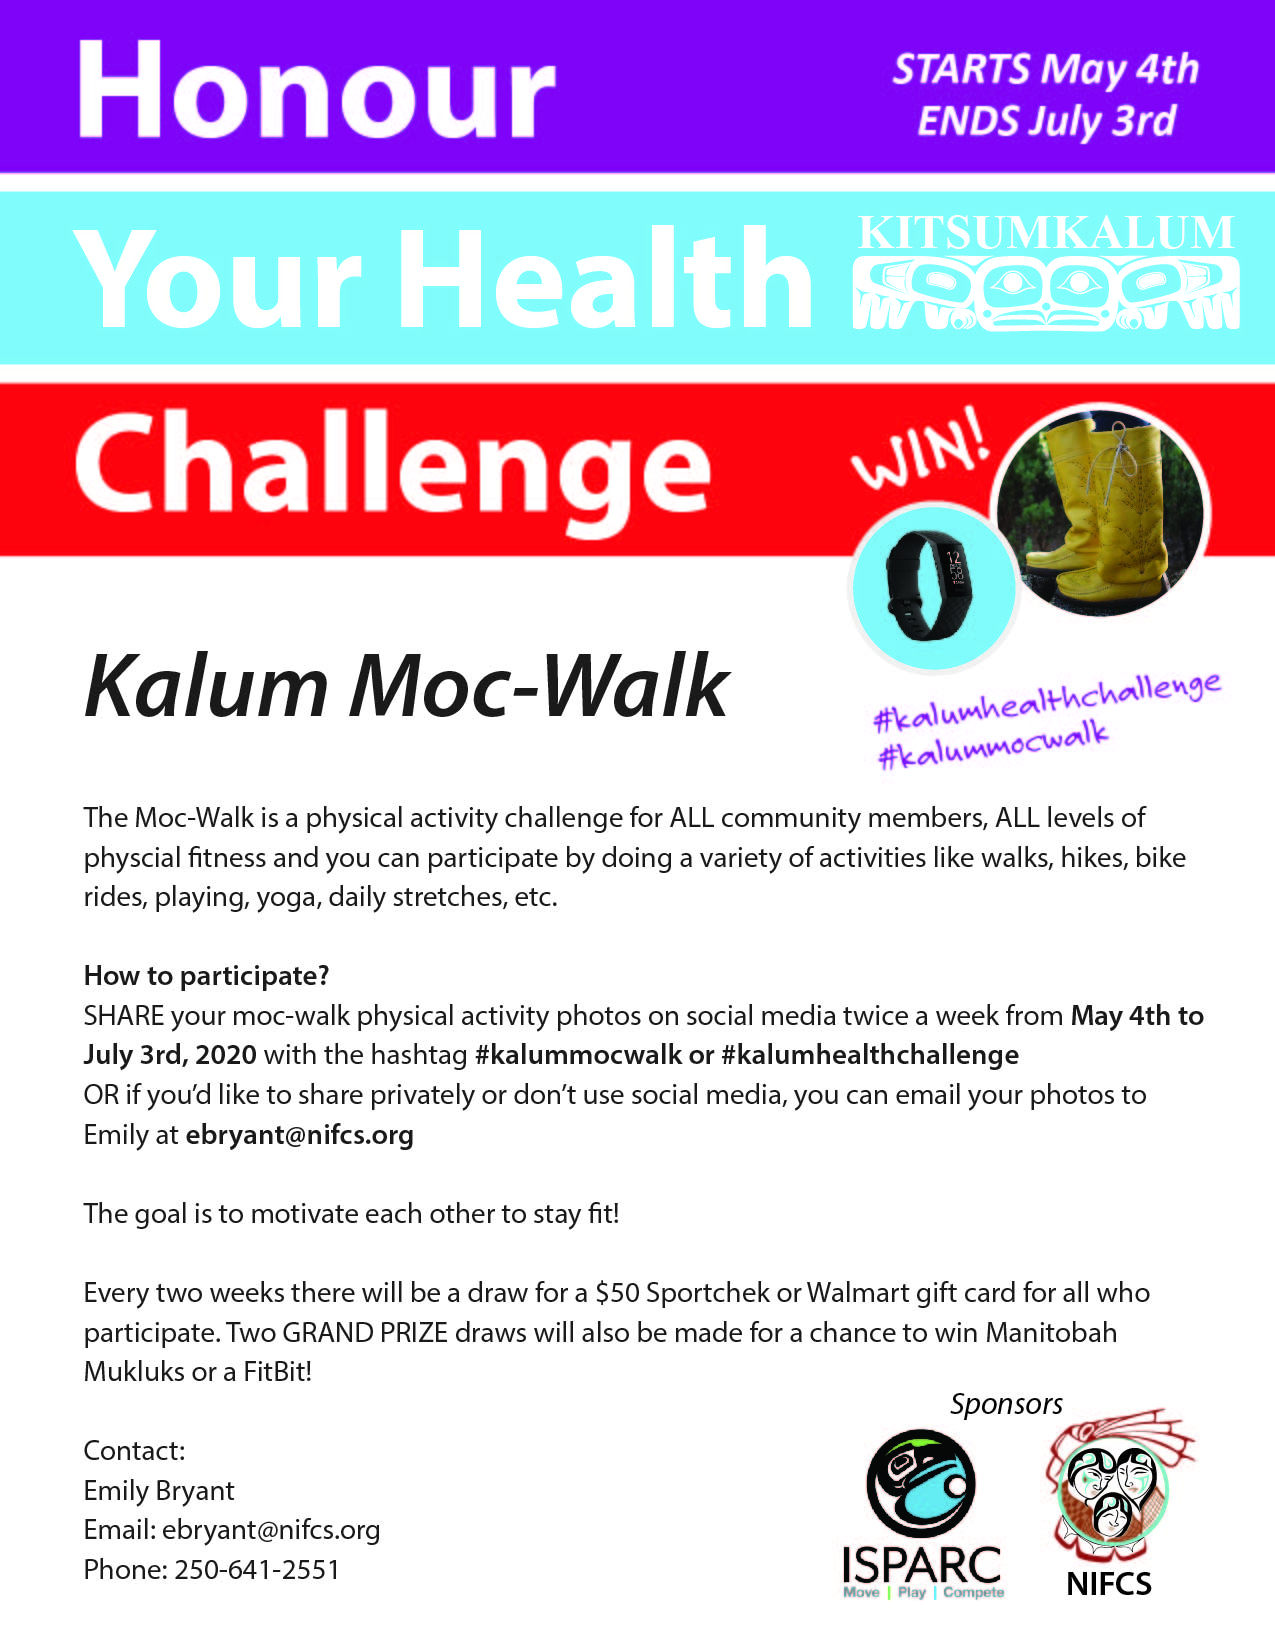 Honour Your Health Challenge Kitsumkalum